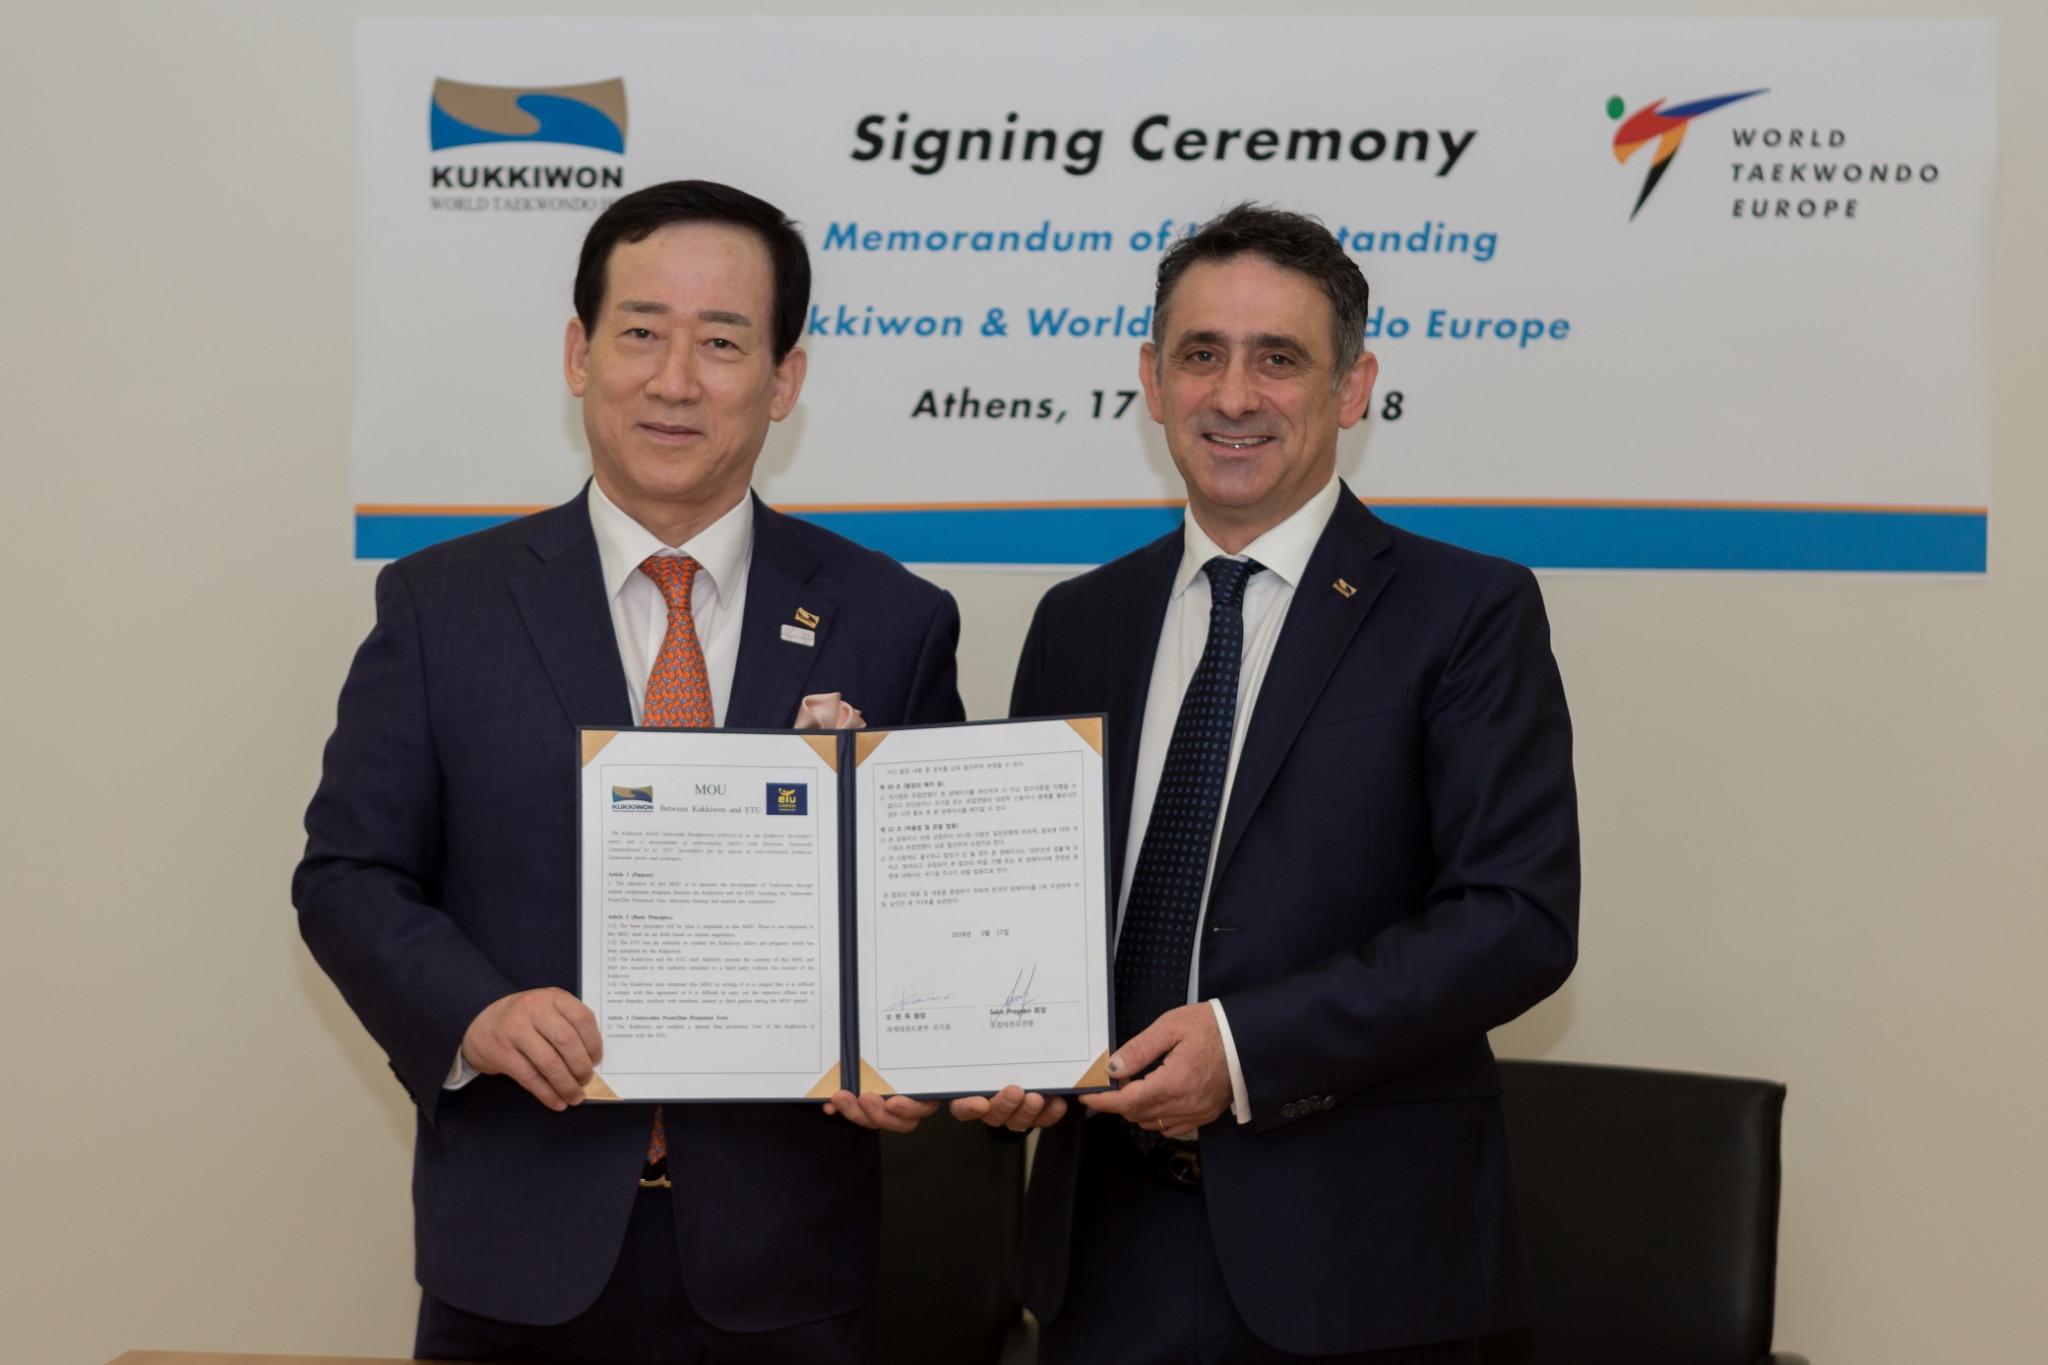 World Taekwondo Europe sign deal with Kukkiwon